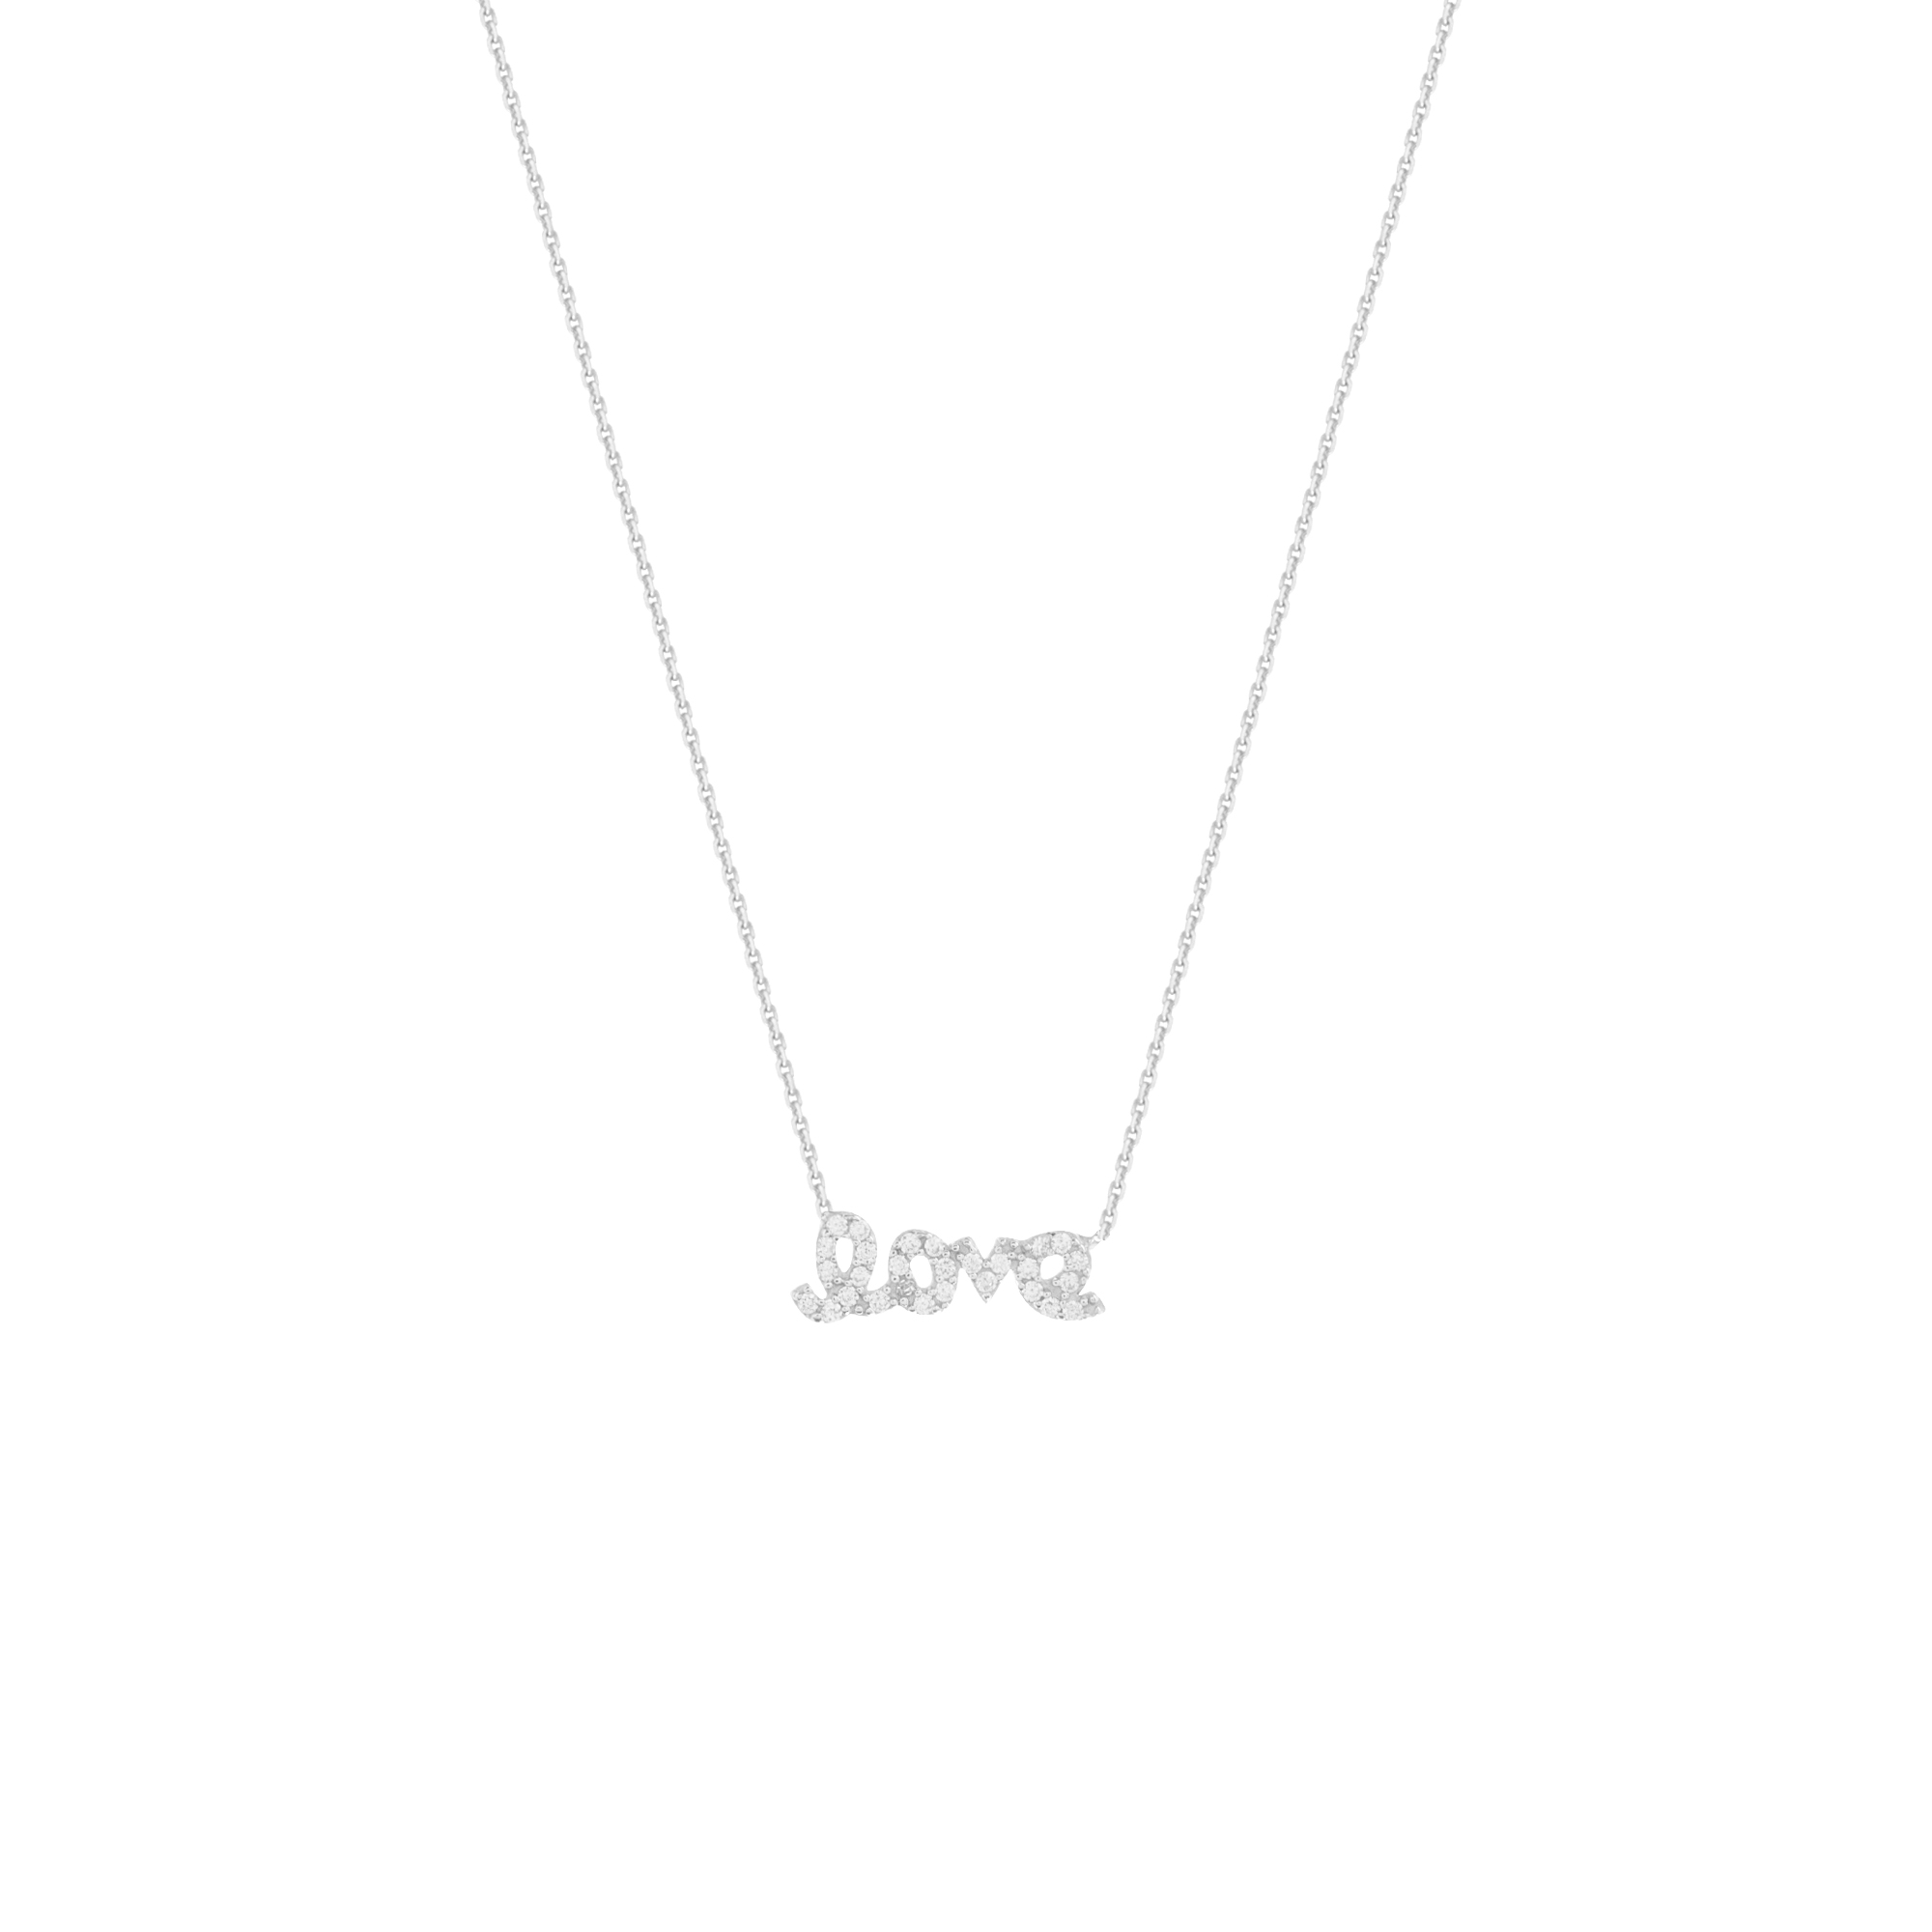 Love Necklace, 14Kt Gold & Cz Necklace 18